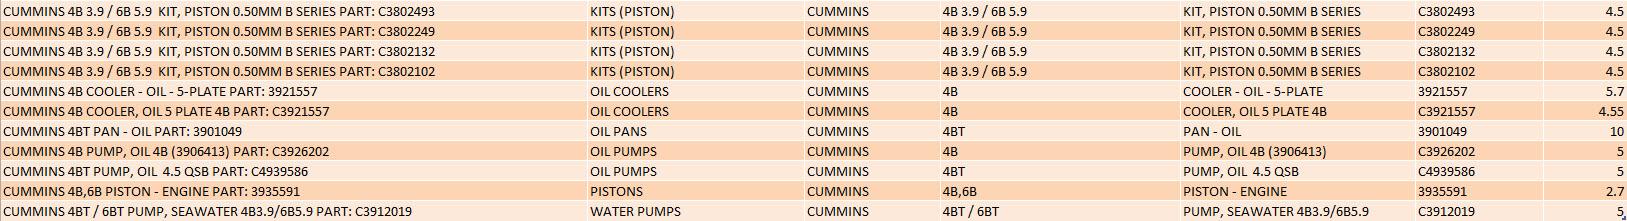 Cummins 4BTA Parts For Sale